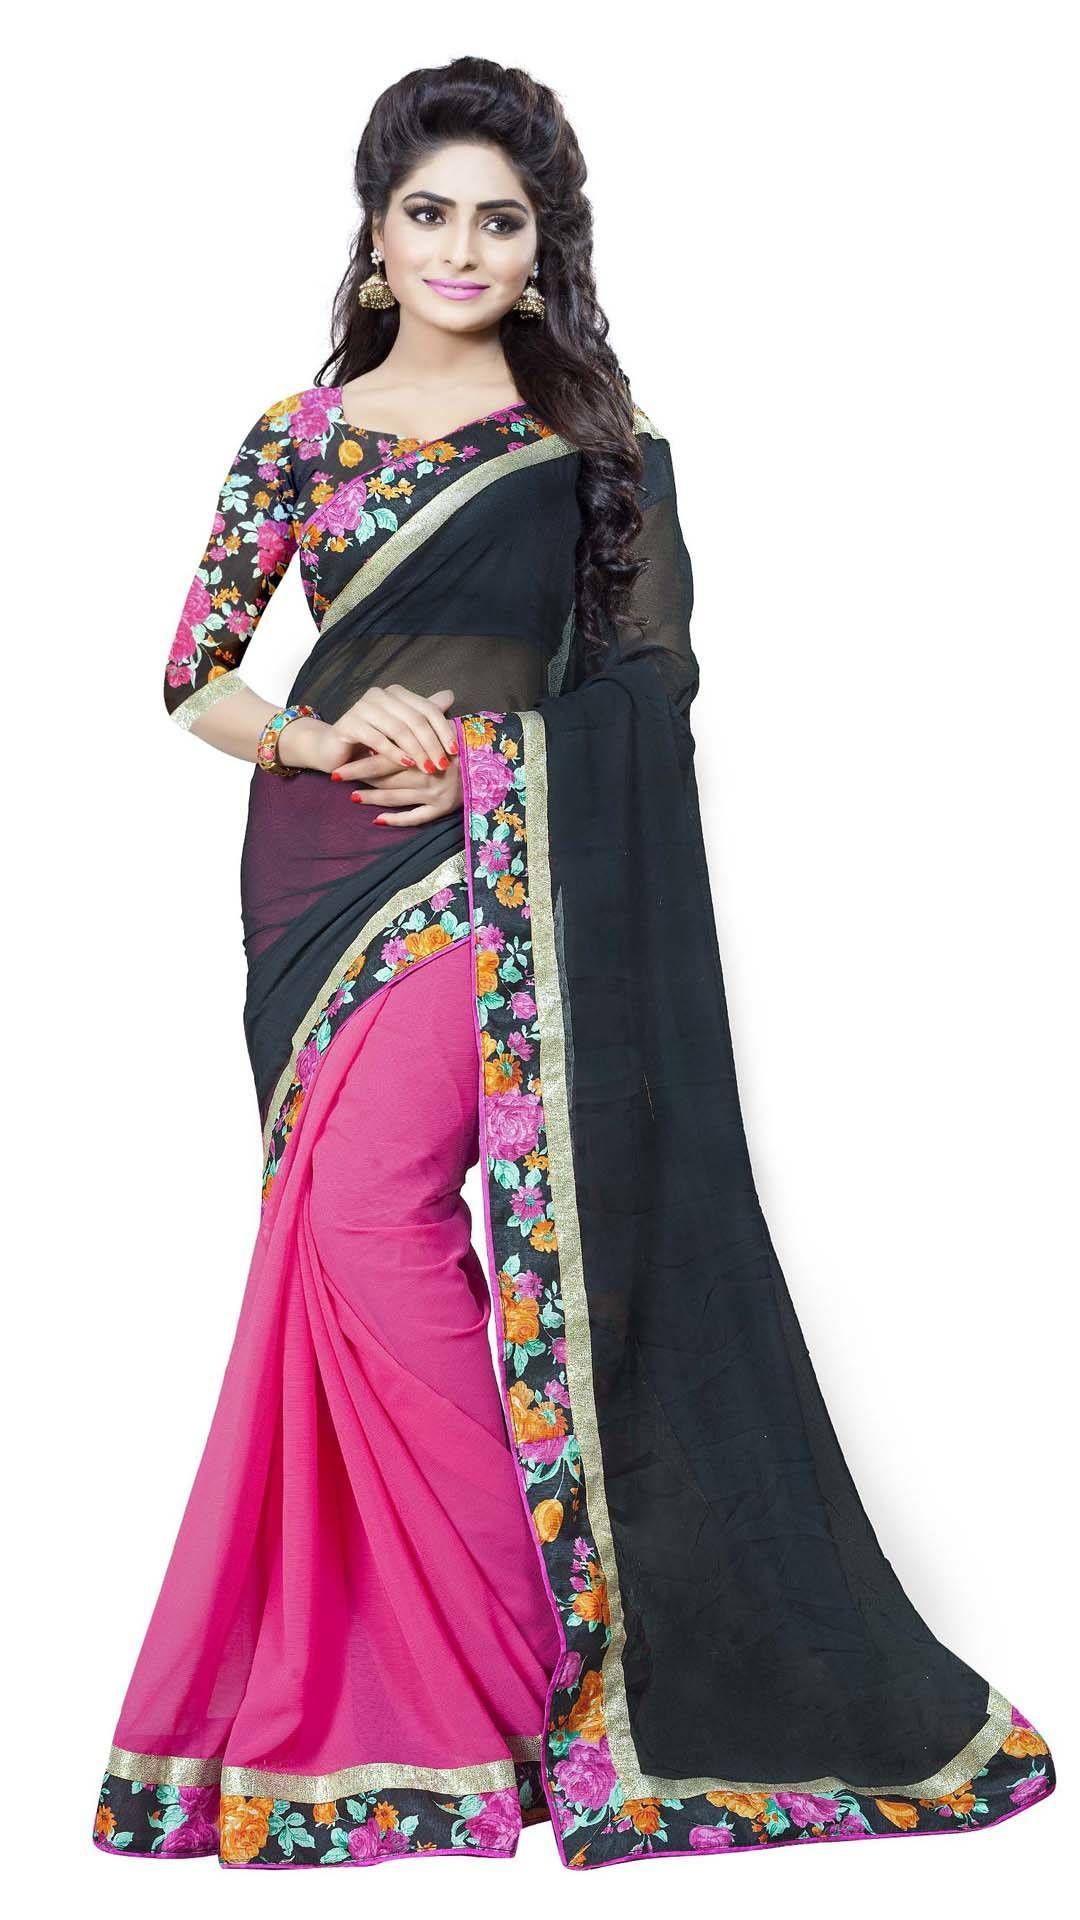 daed558b3b Buy Aai shree khodiyar art Multi Color Faux Chiffon Saree Online at Low Prices  in India - Paytm.com